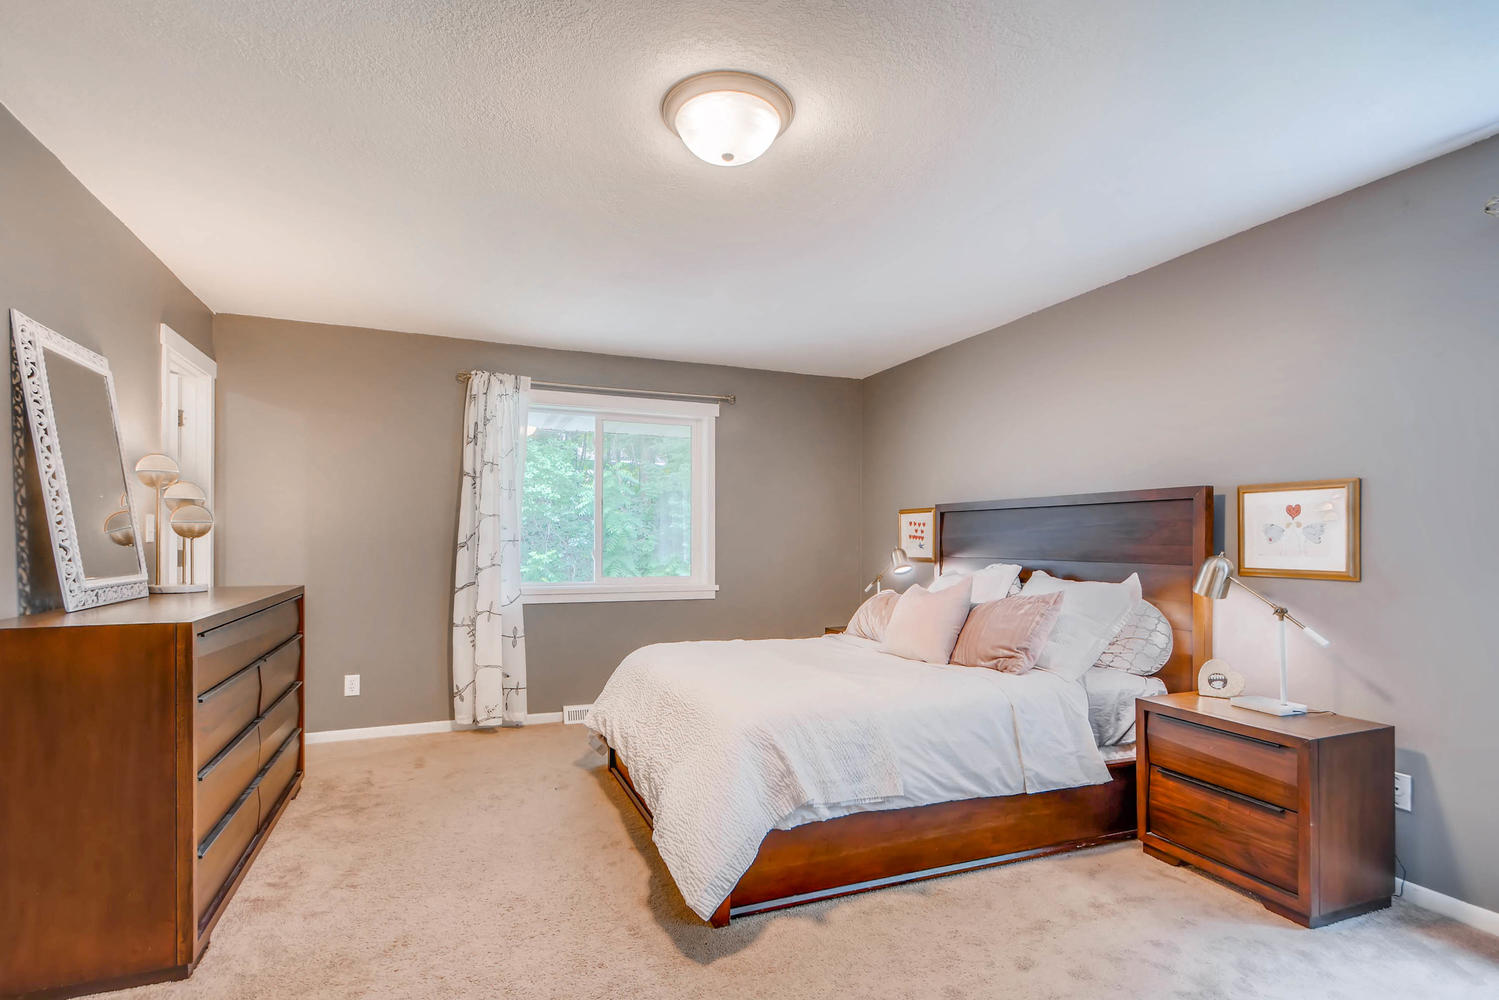 2111 Victoria Street N-large-014-13-Master Bedroom-1499x1000-72dpi.jpg